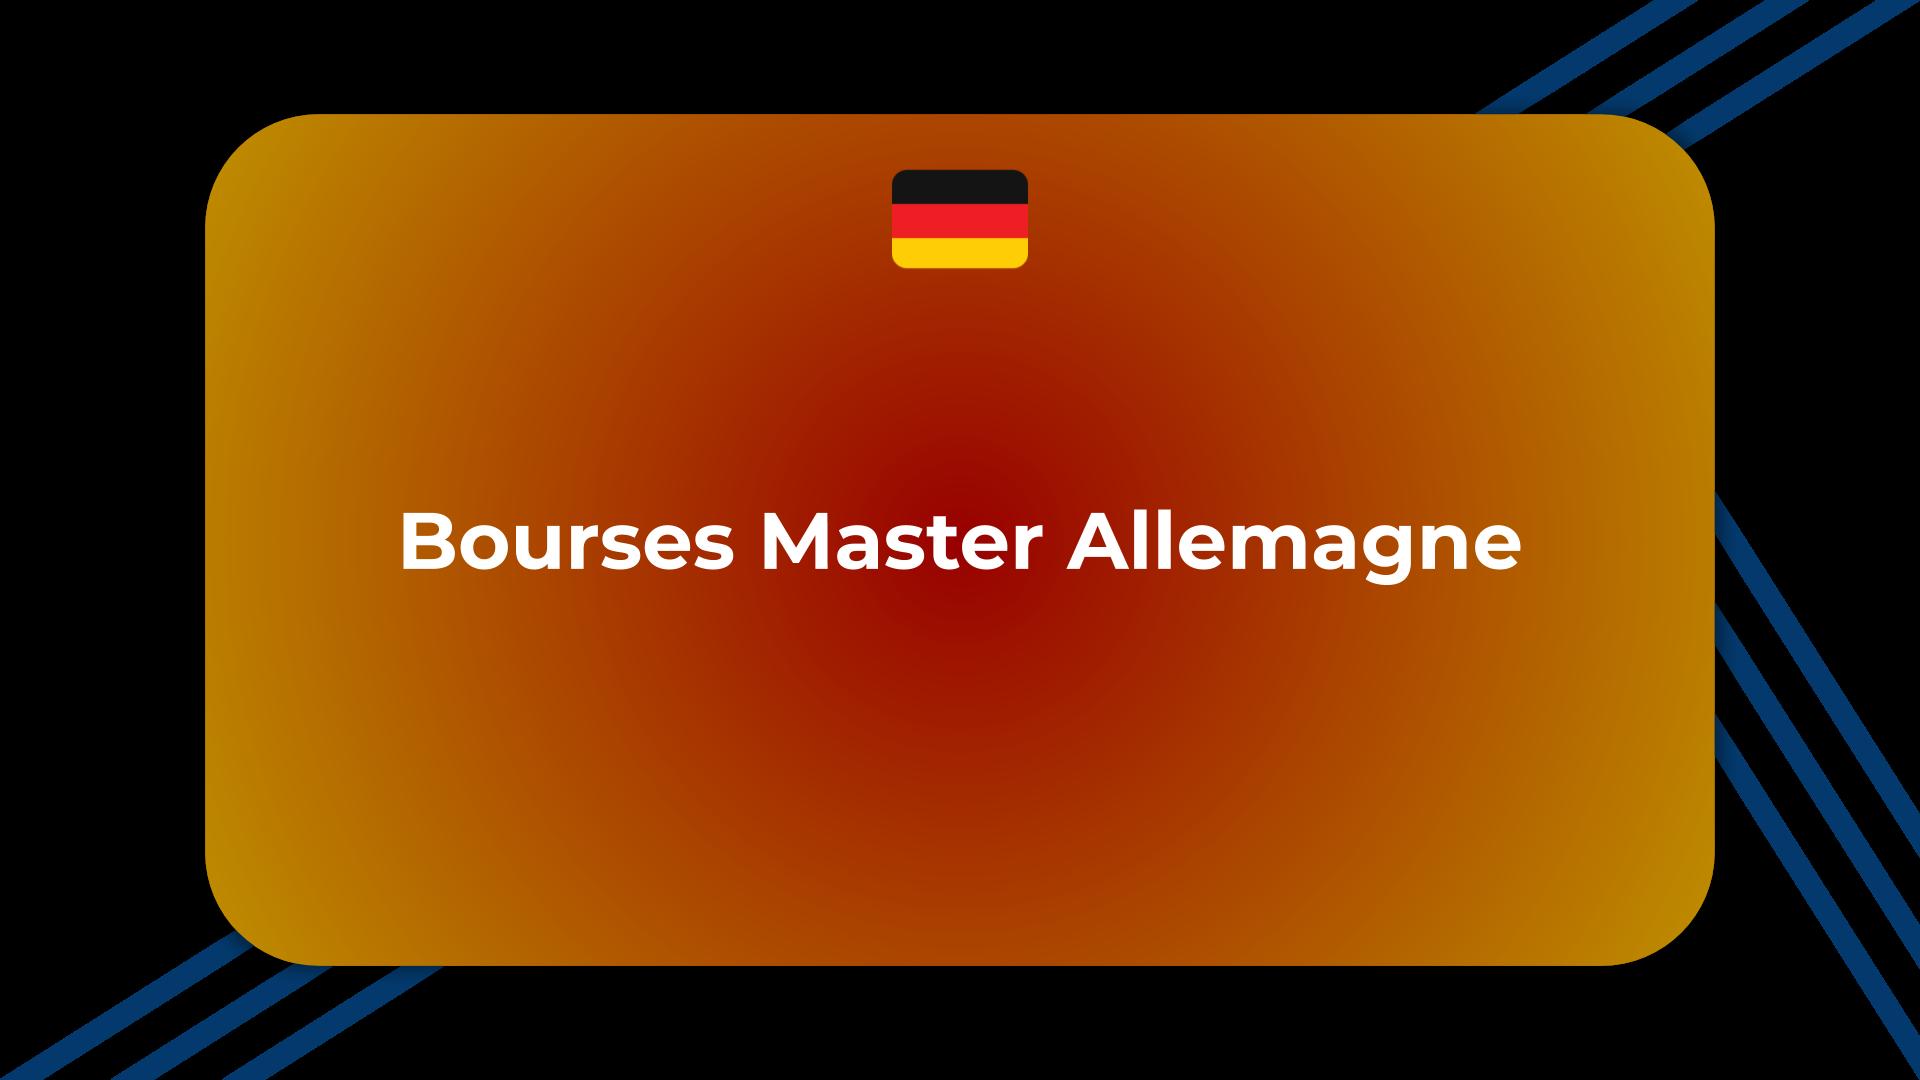 Bourses Master Allemagne